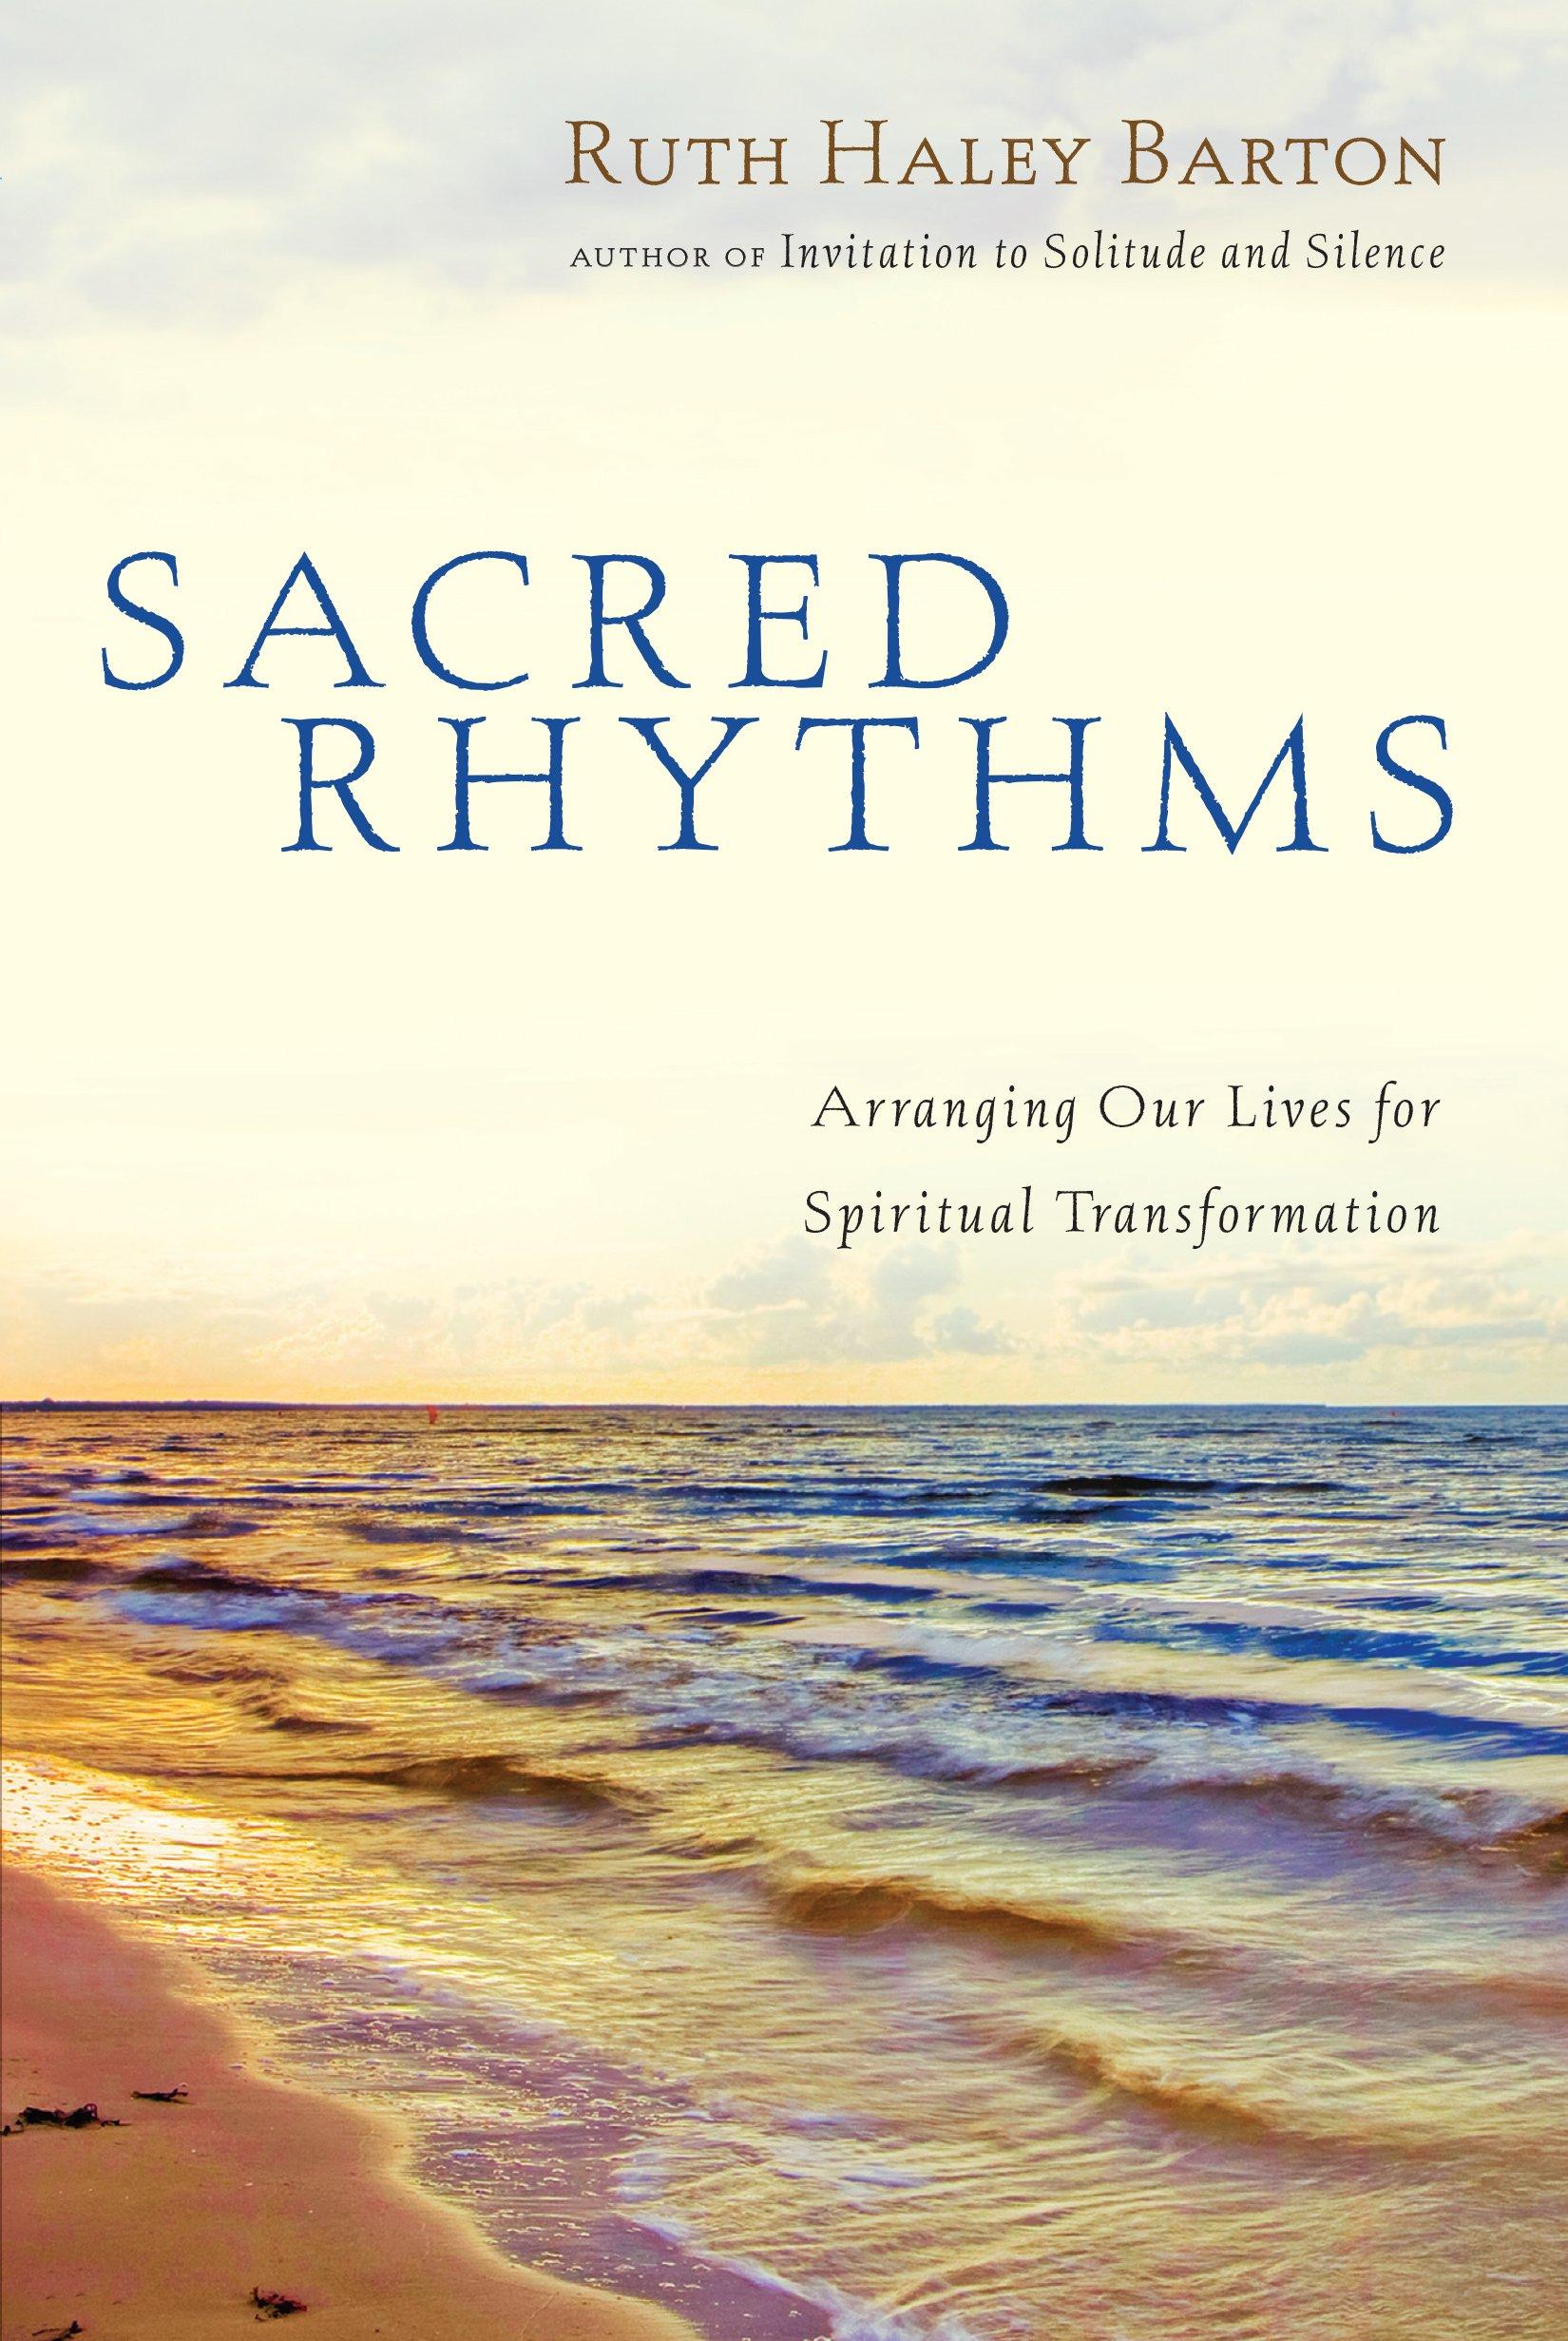 Sacred Rhythms: Arranging Our Lives for Spiritual Transformation   Ruth Haley Barton